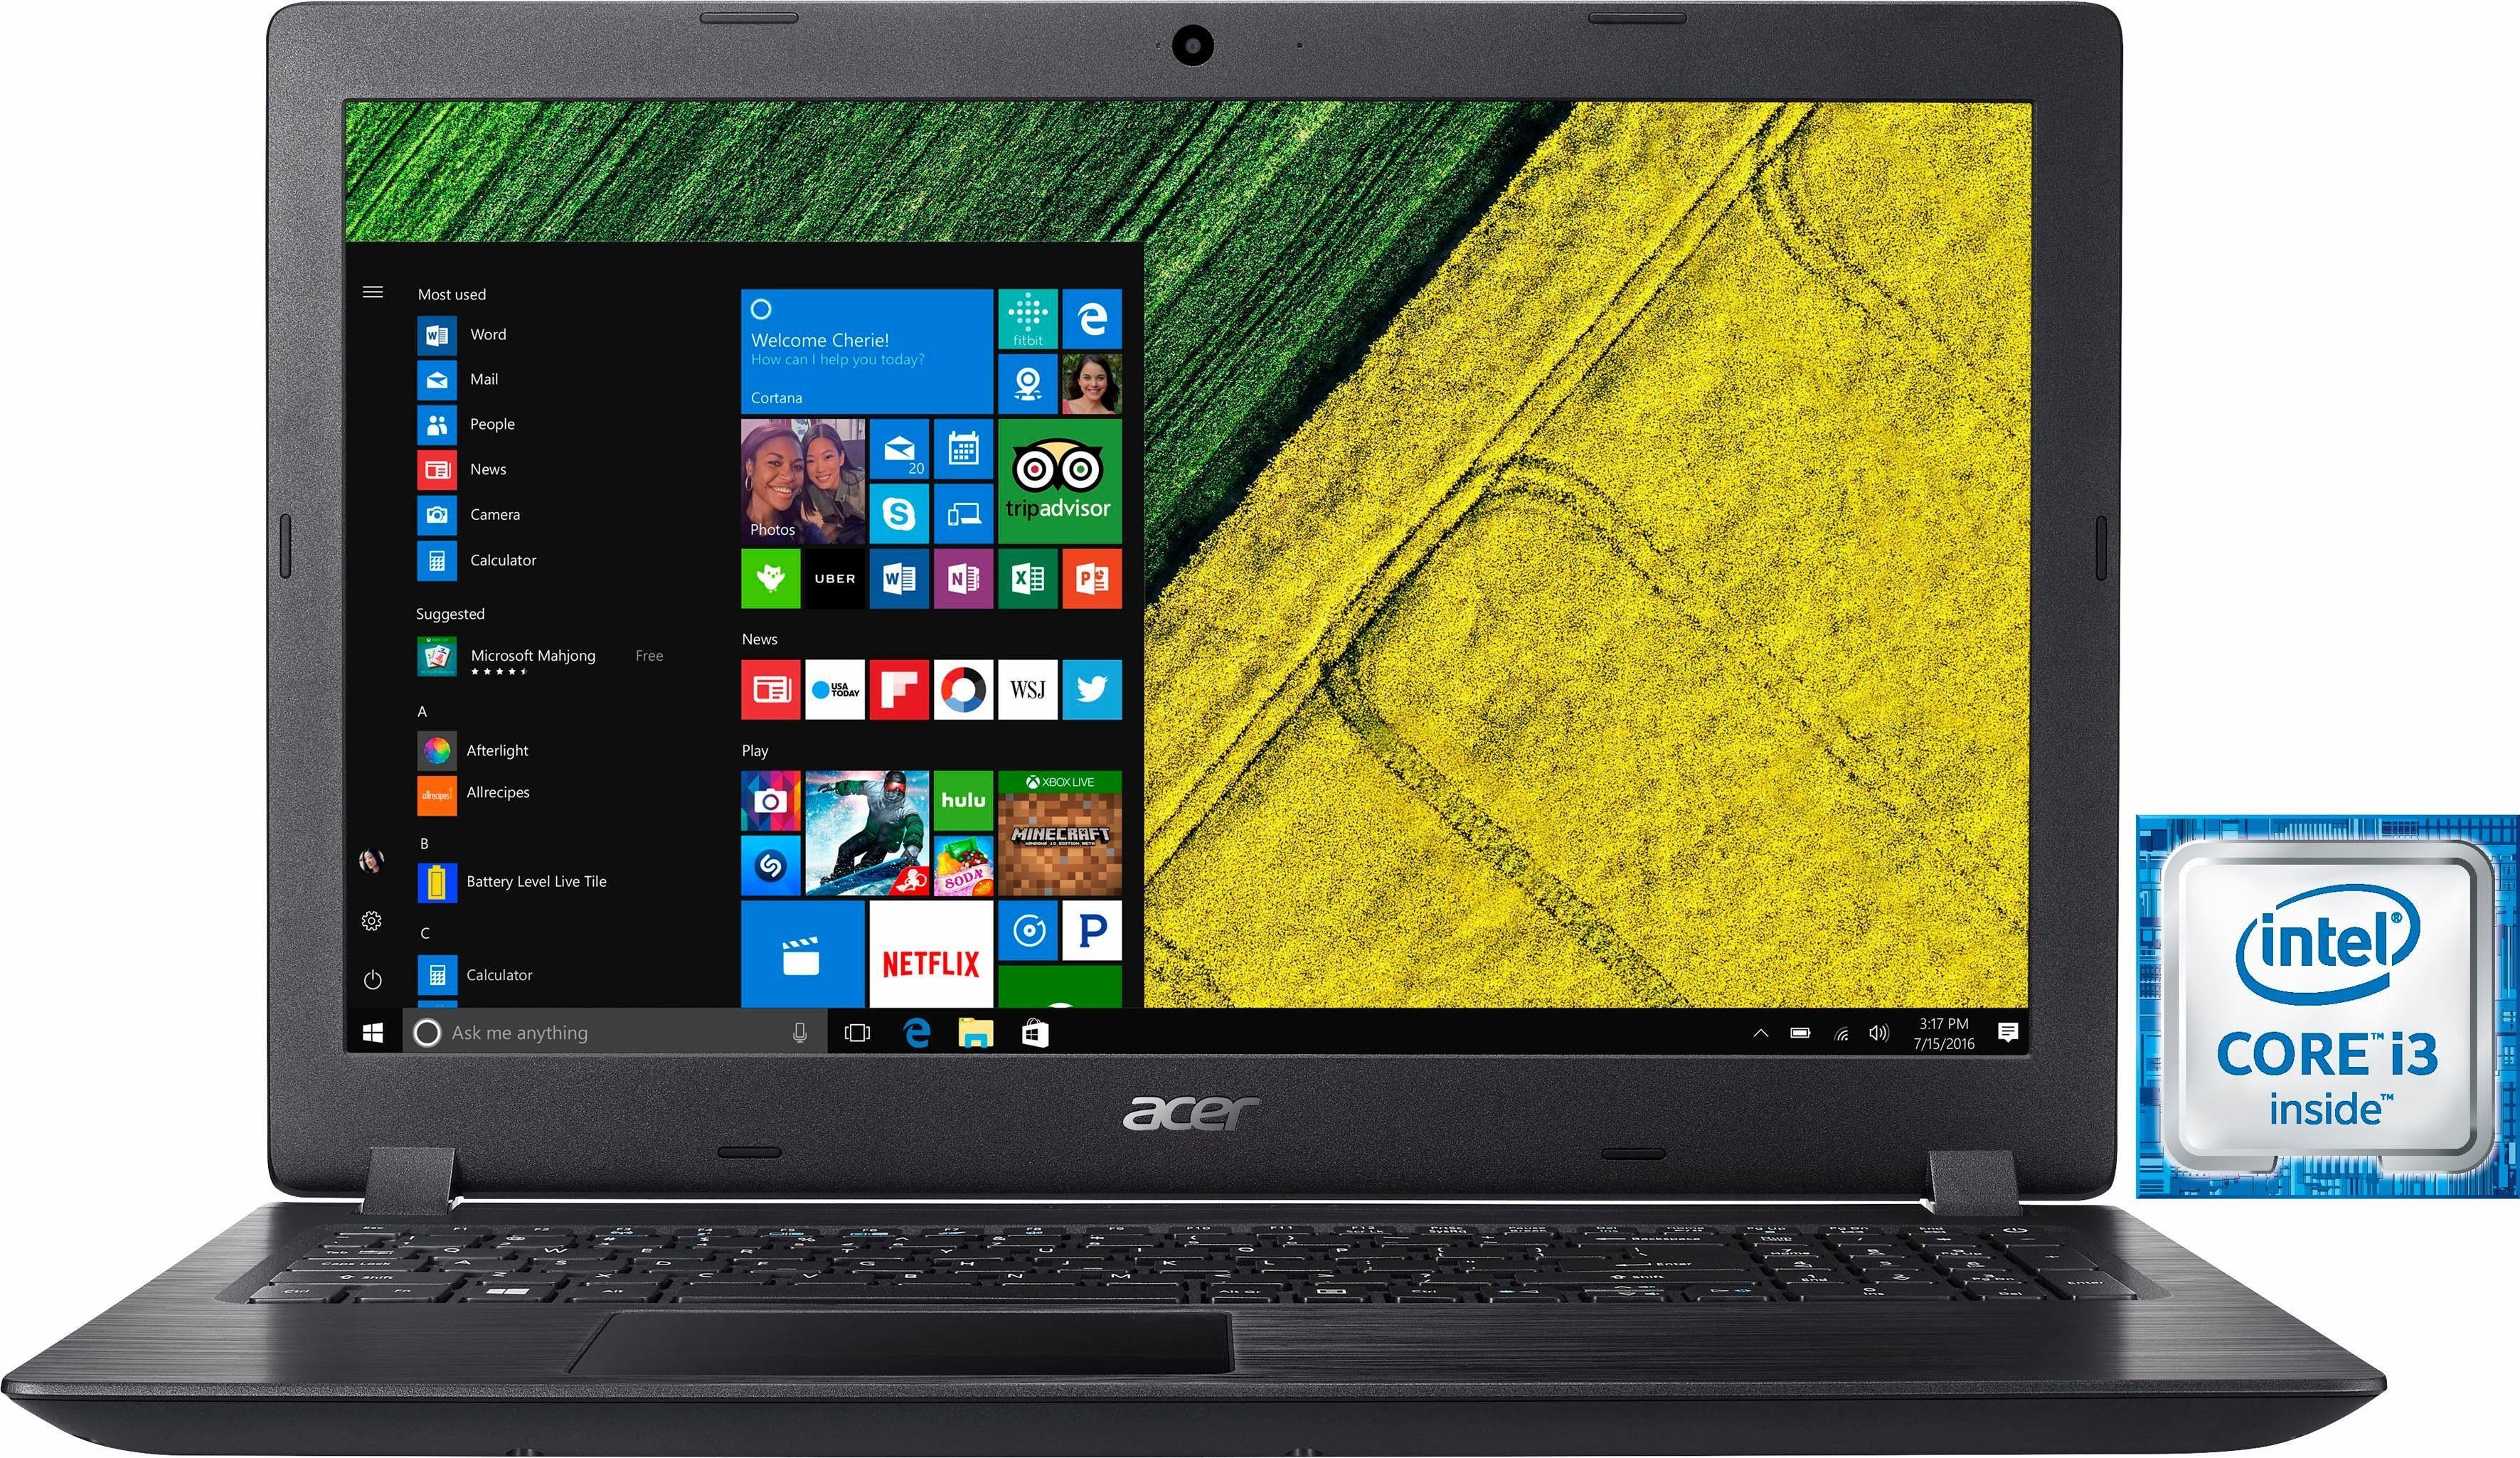 Acer Aspire A315-51-373T Notebook, Intel® Core™ i3, 39,6 cm (15,6 Zoll), 1128 GB Speicher